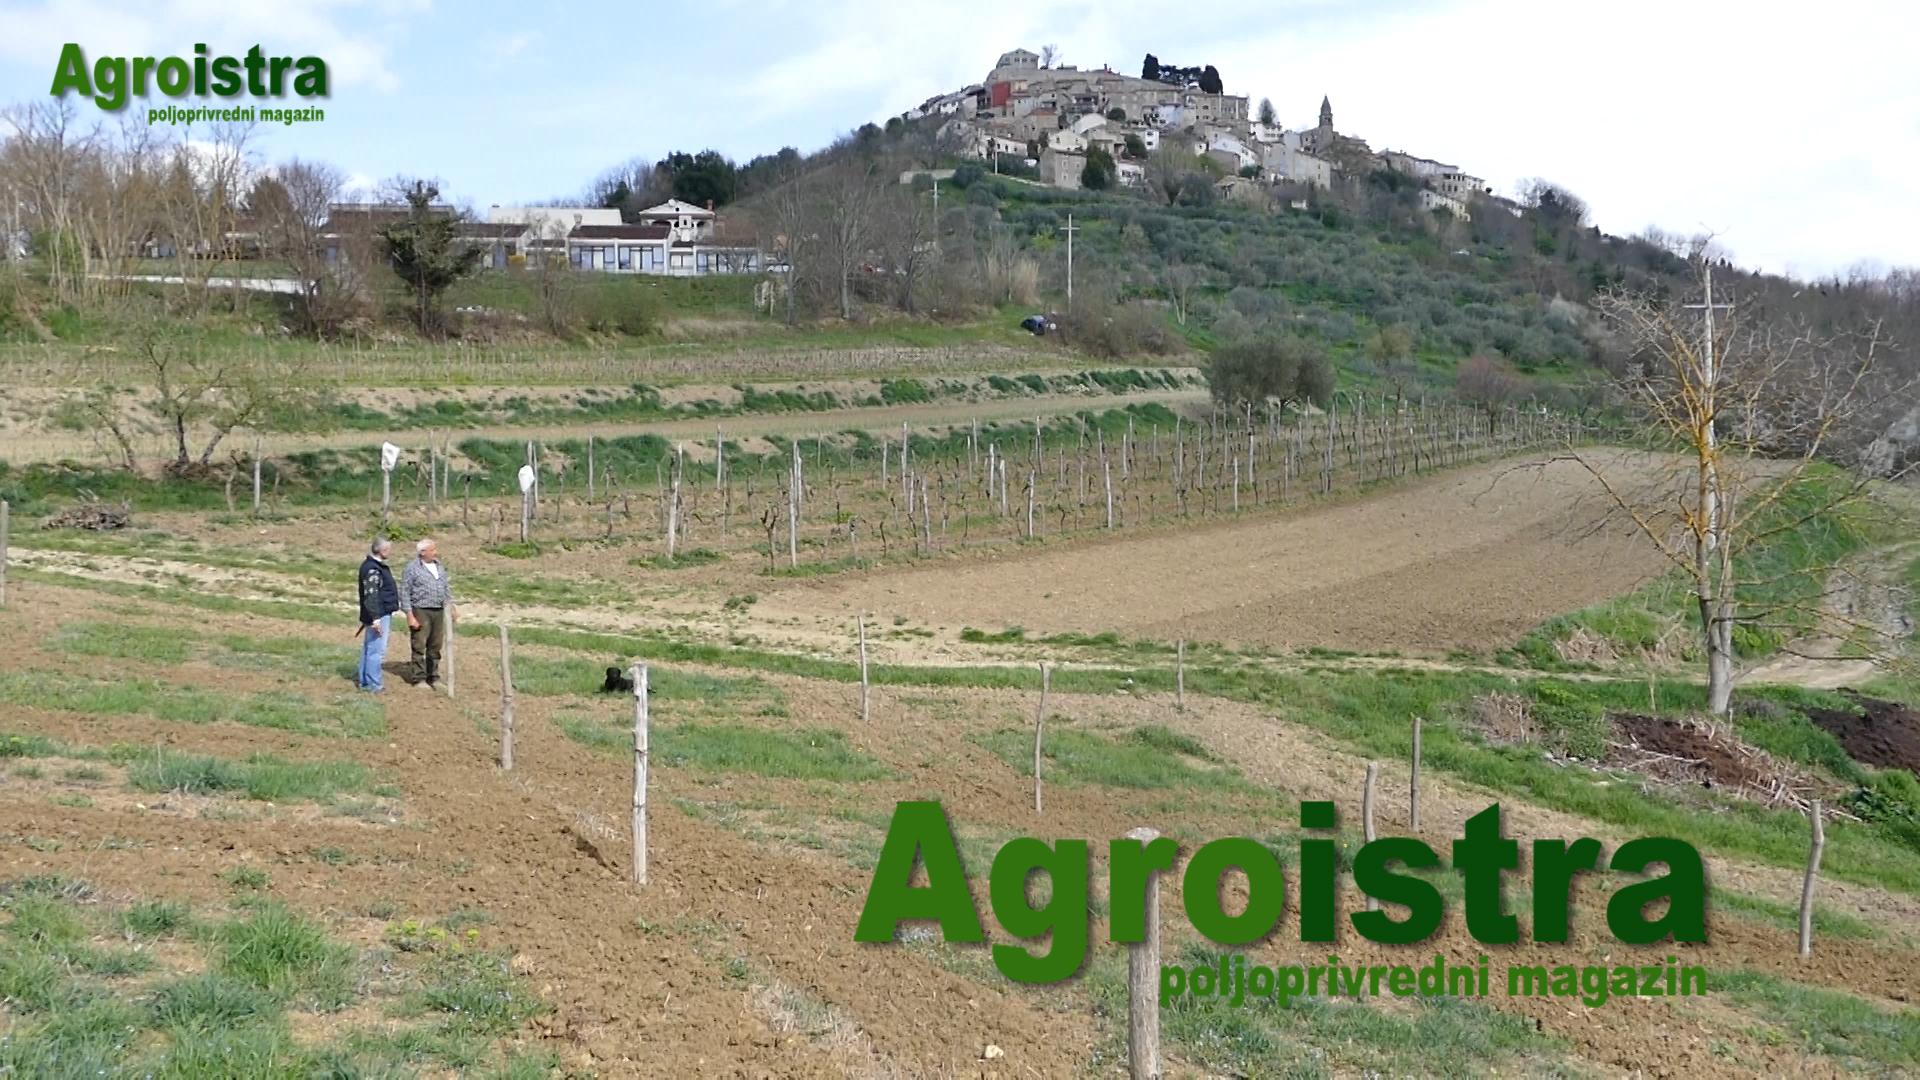 Poljoprivredni magazin AGROISTRA 8.4.2017.